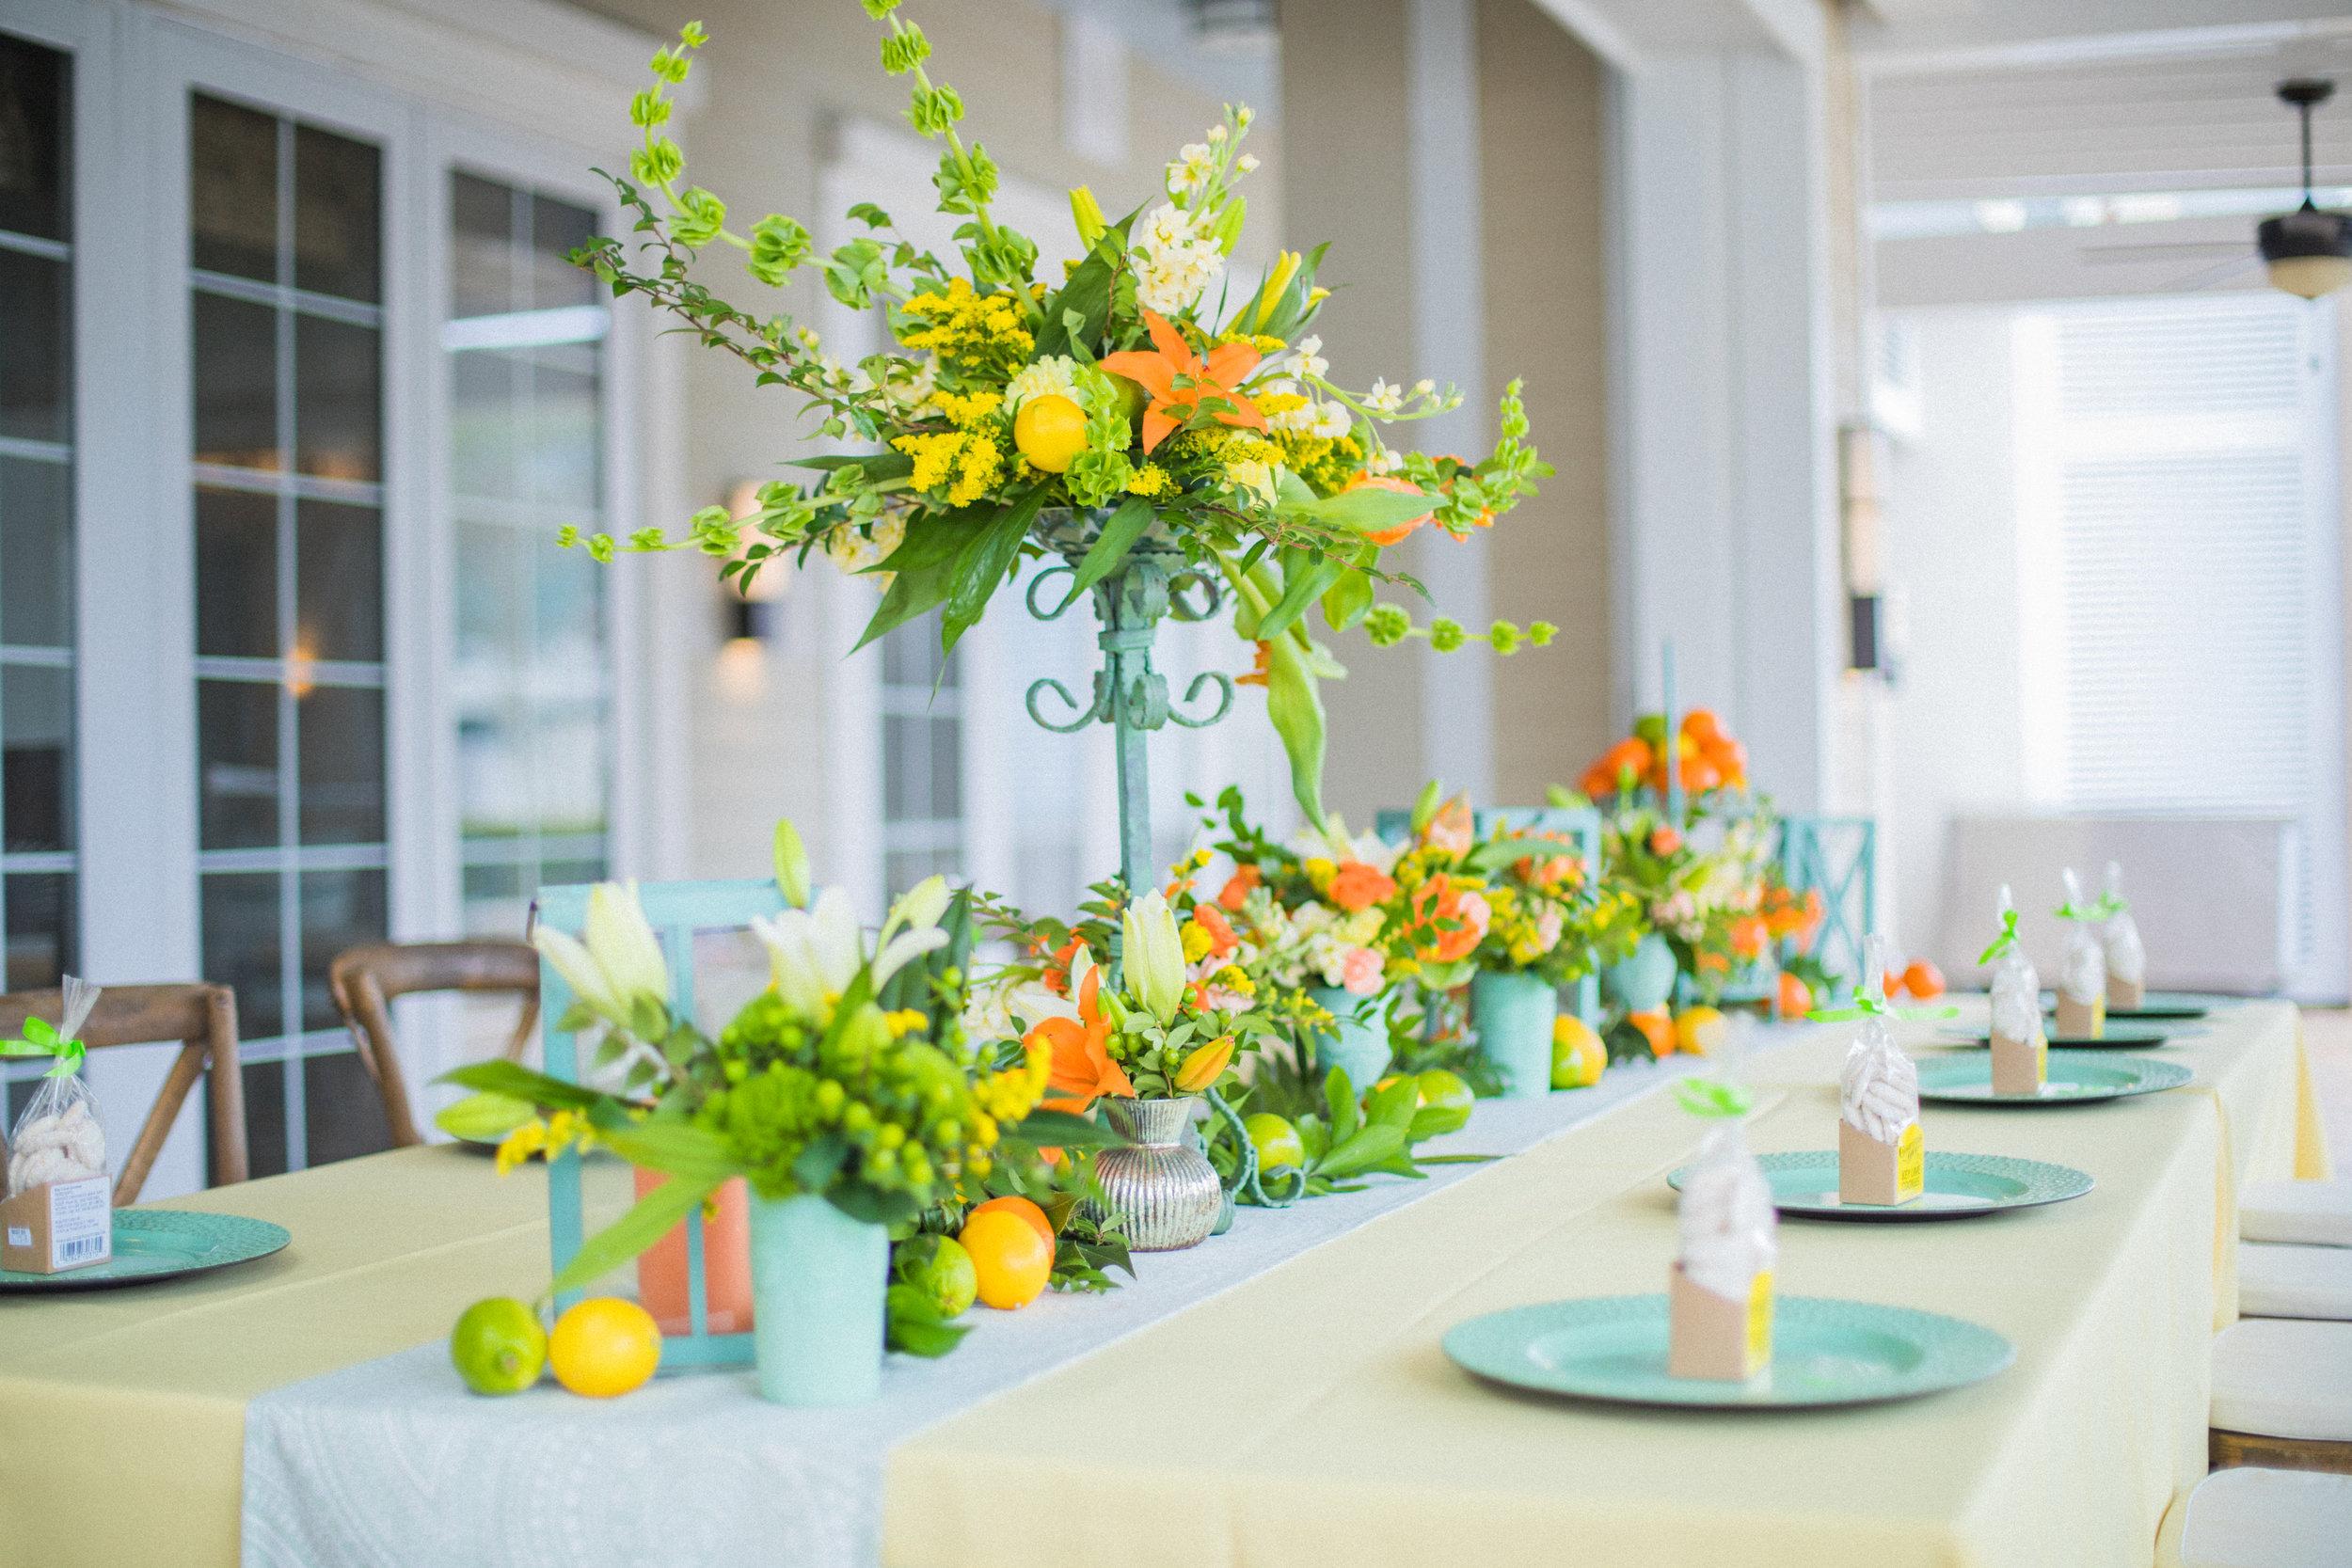 Morning Brunch at Wild Dunes Resort  //  Charleston wedding photography by Jenn Cady Photography  //  A Lowcountry Wedding Magazine & Blog